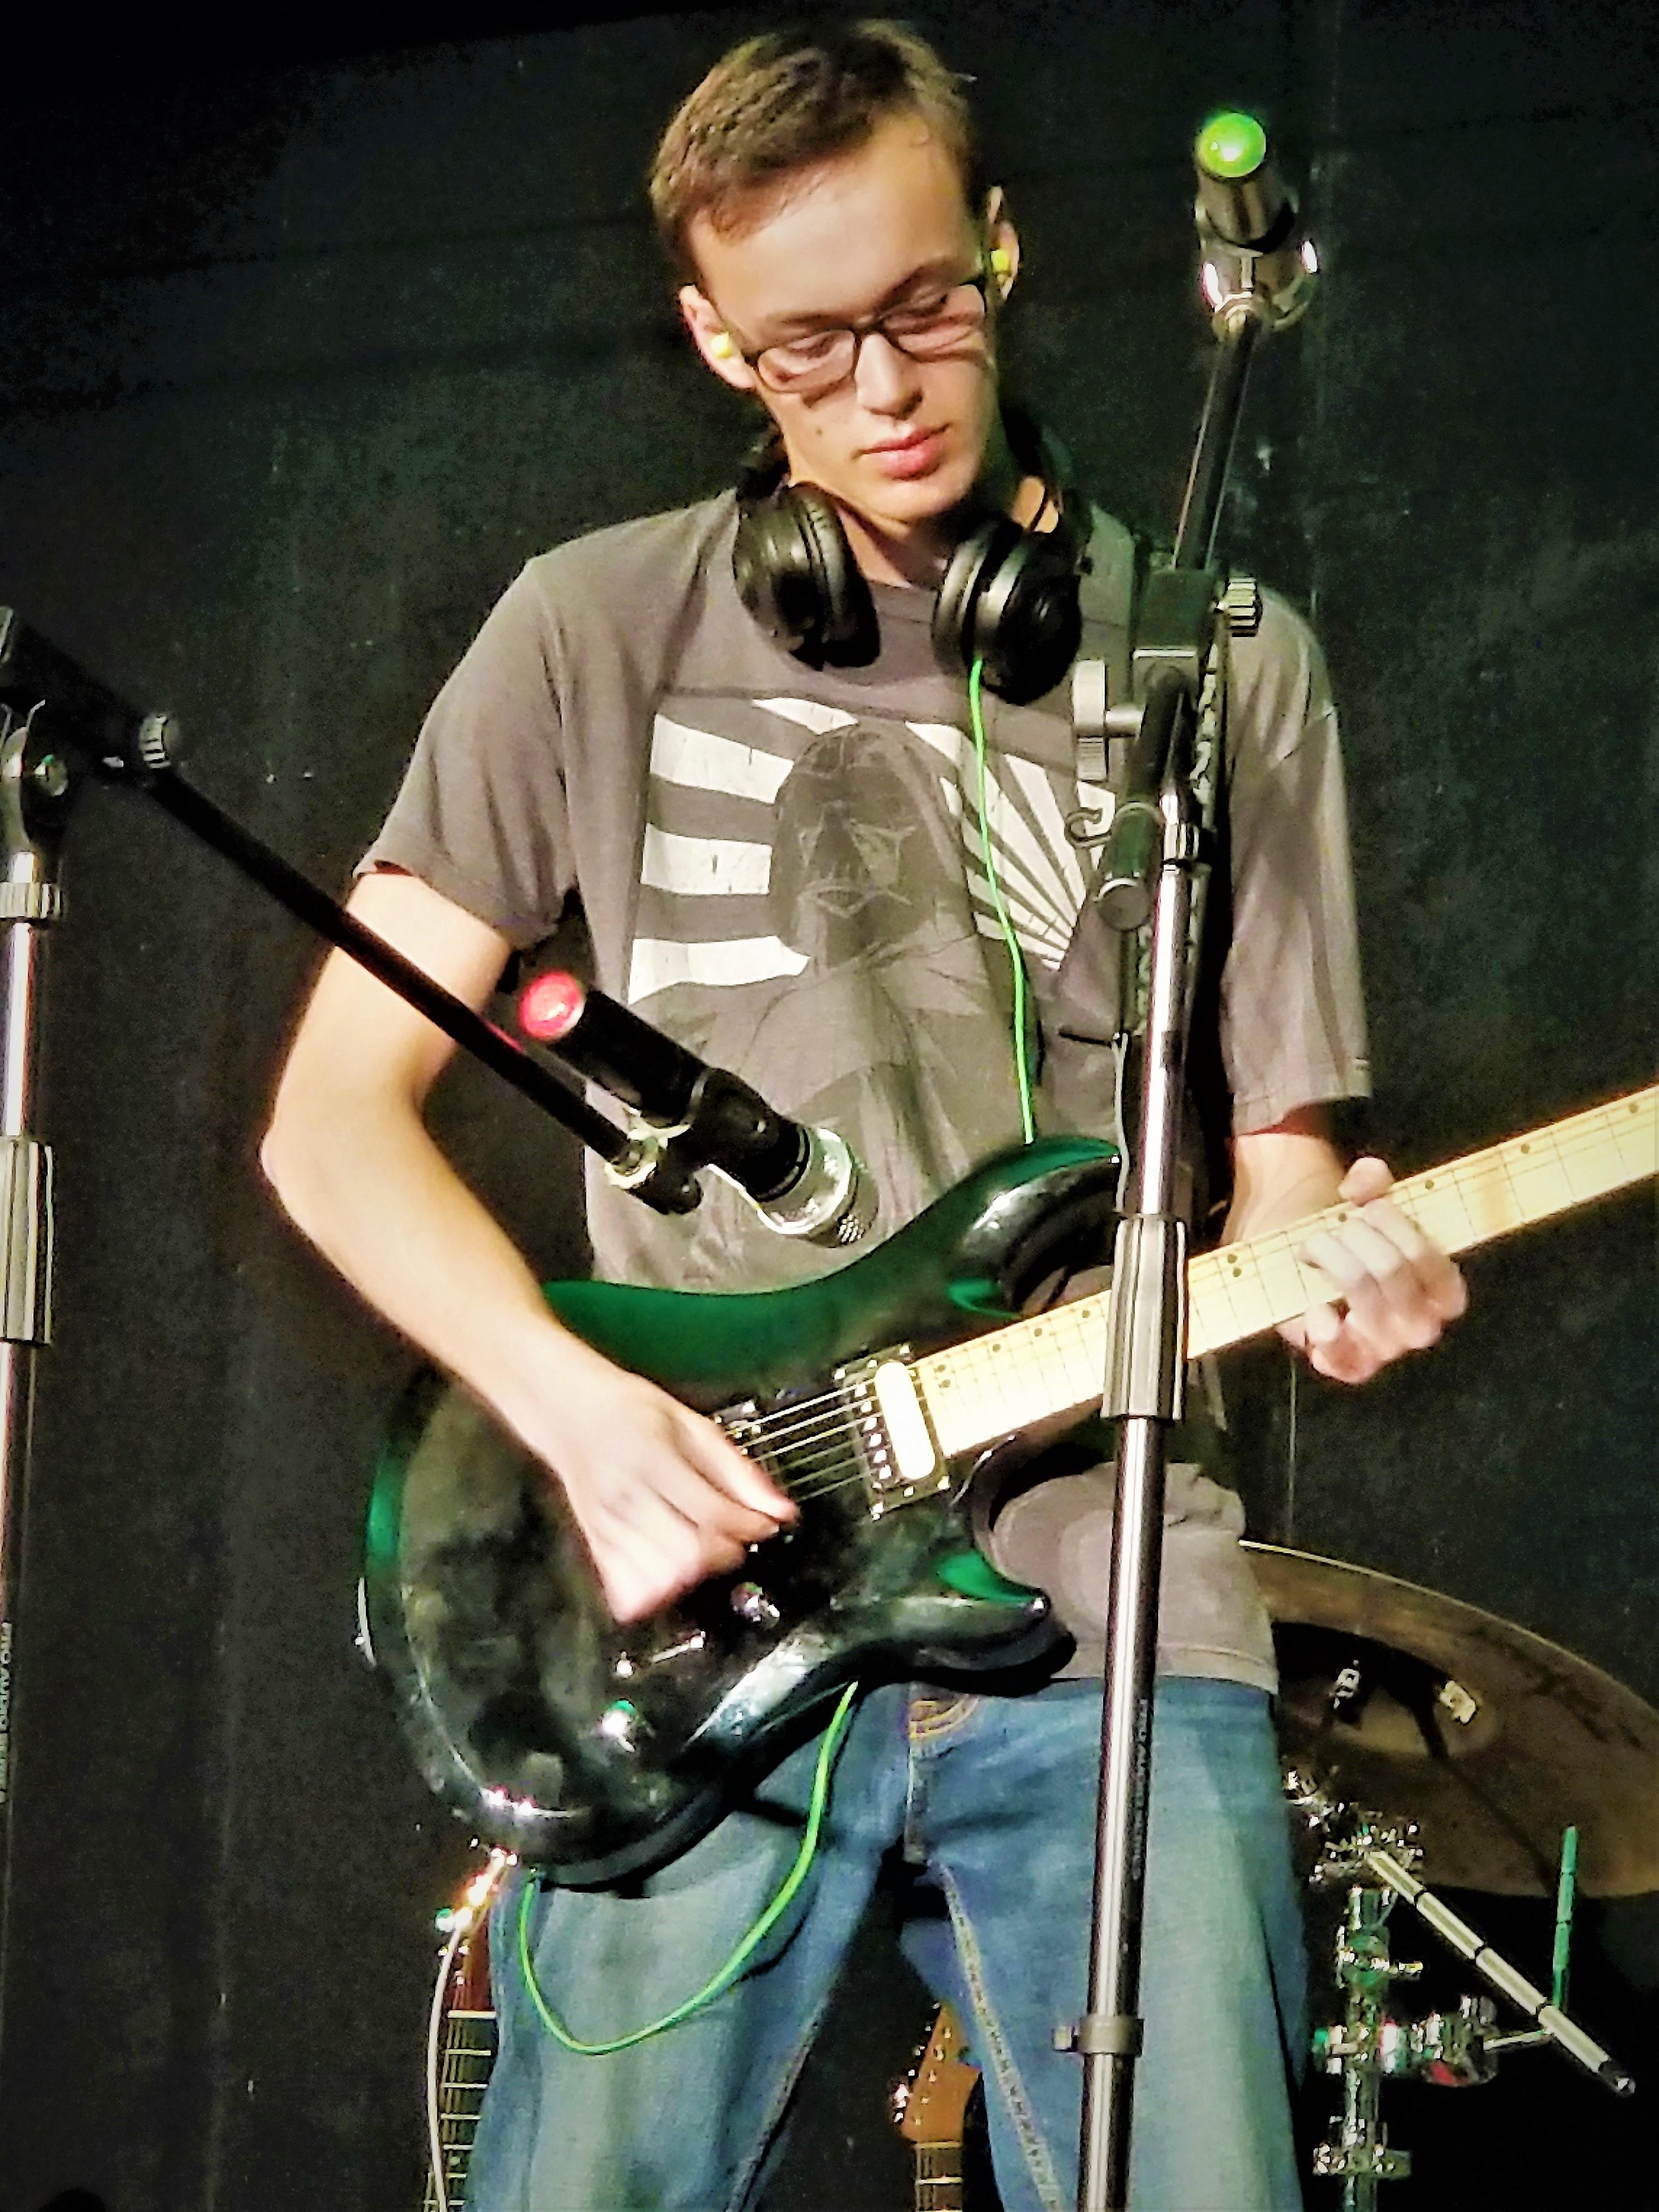 guitar student